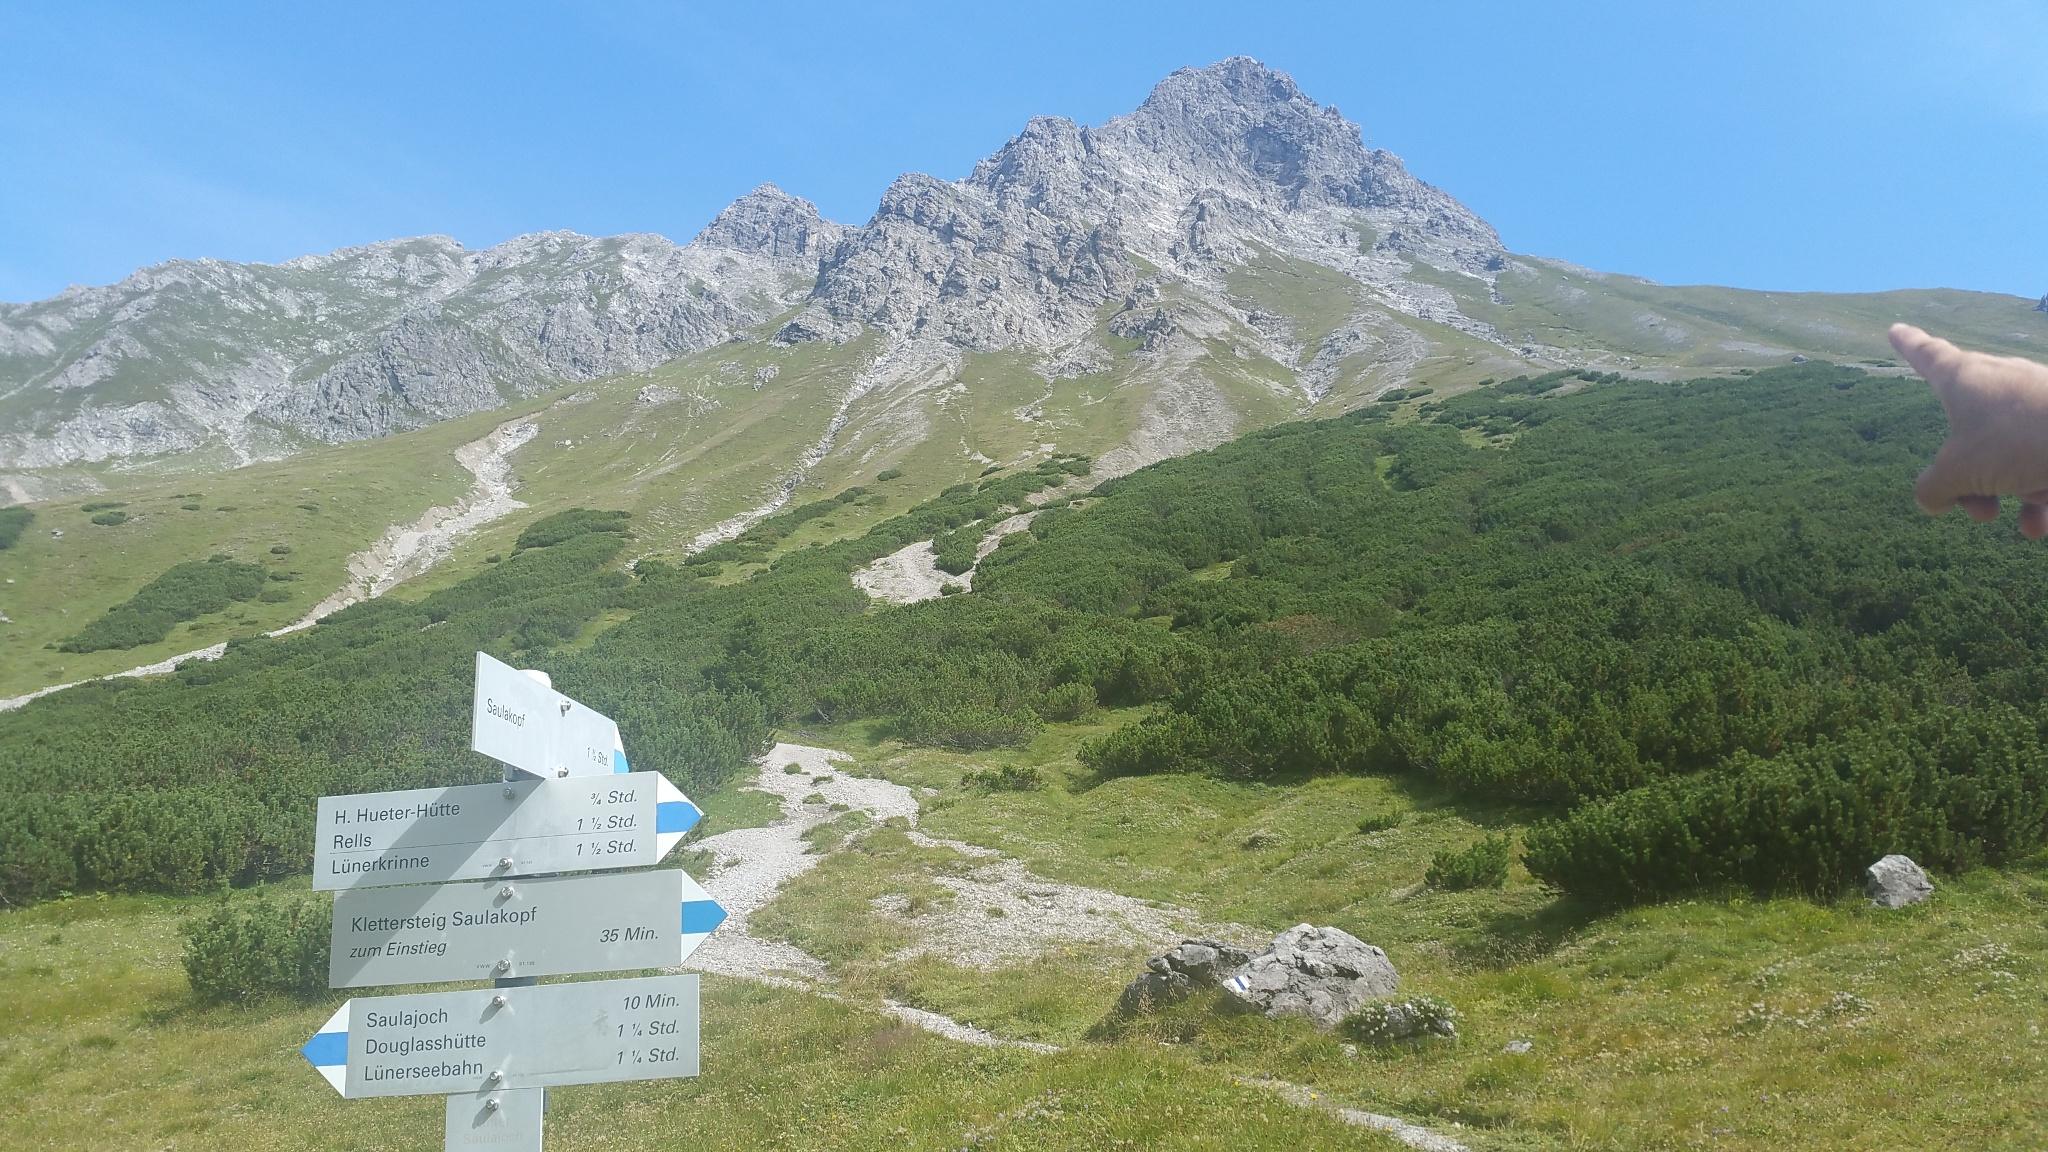 Klettersteig Saulakopf : Gipfeltour saulakopf ostwand Österreichs wanderdörfer